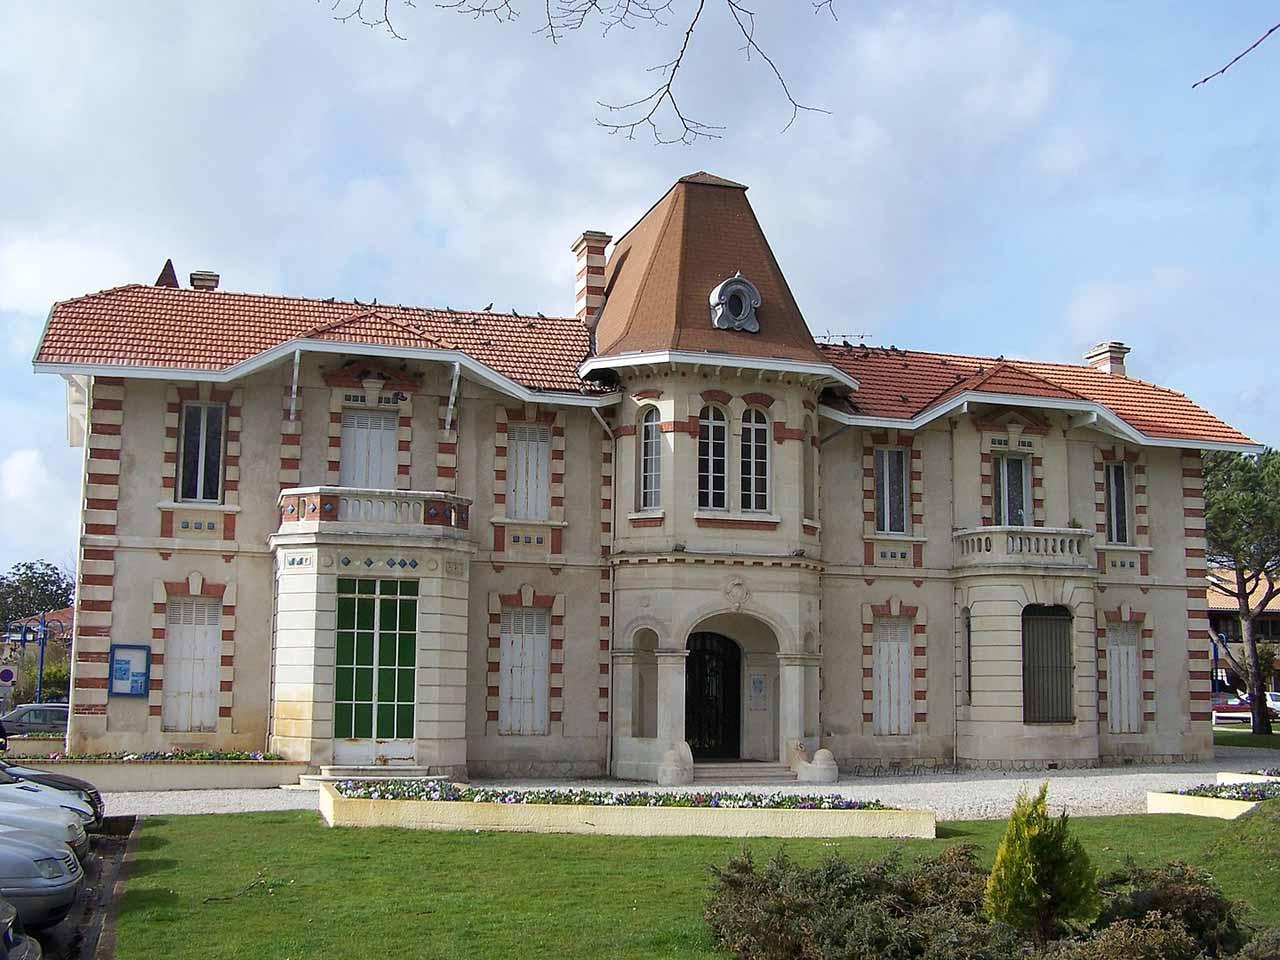 Maison Louis-David